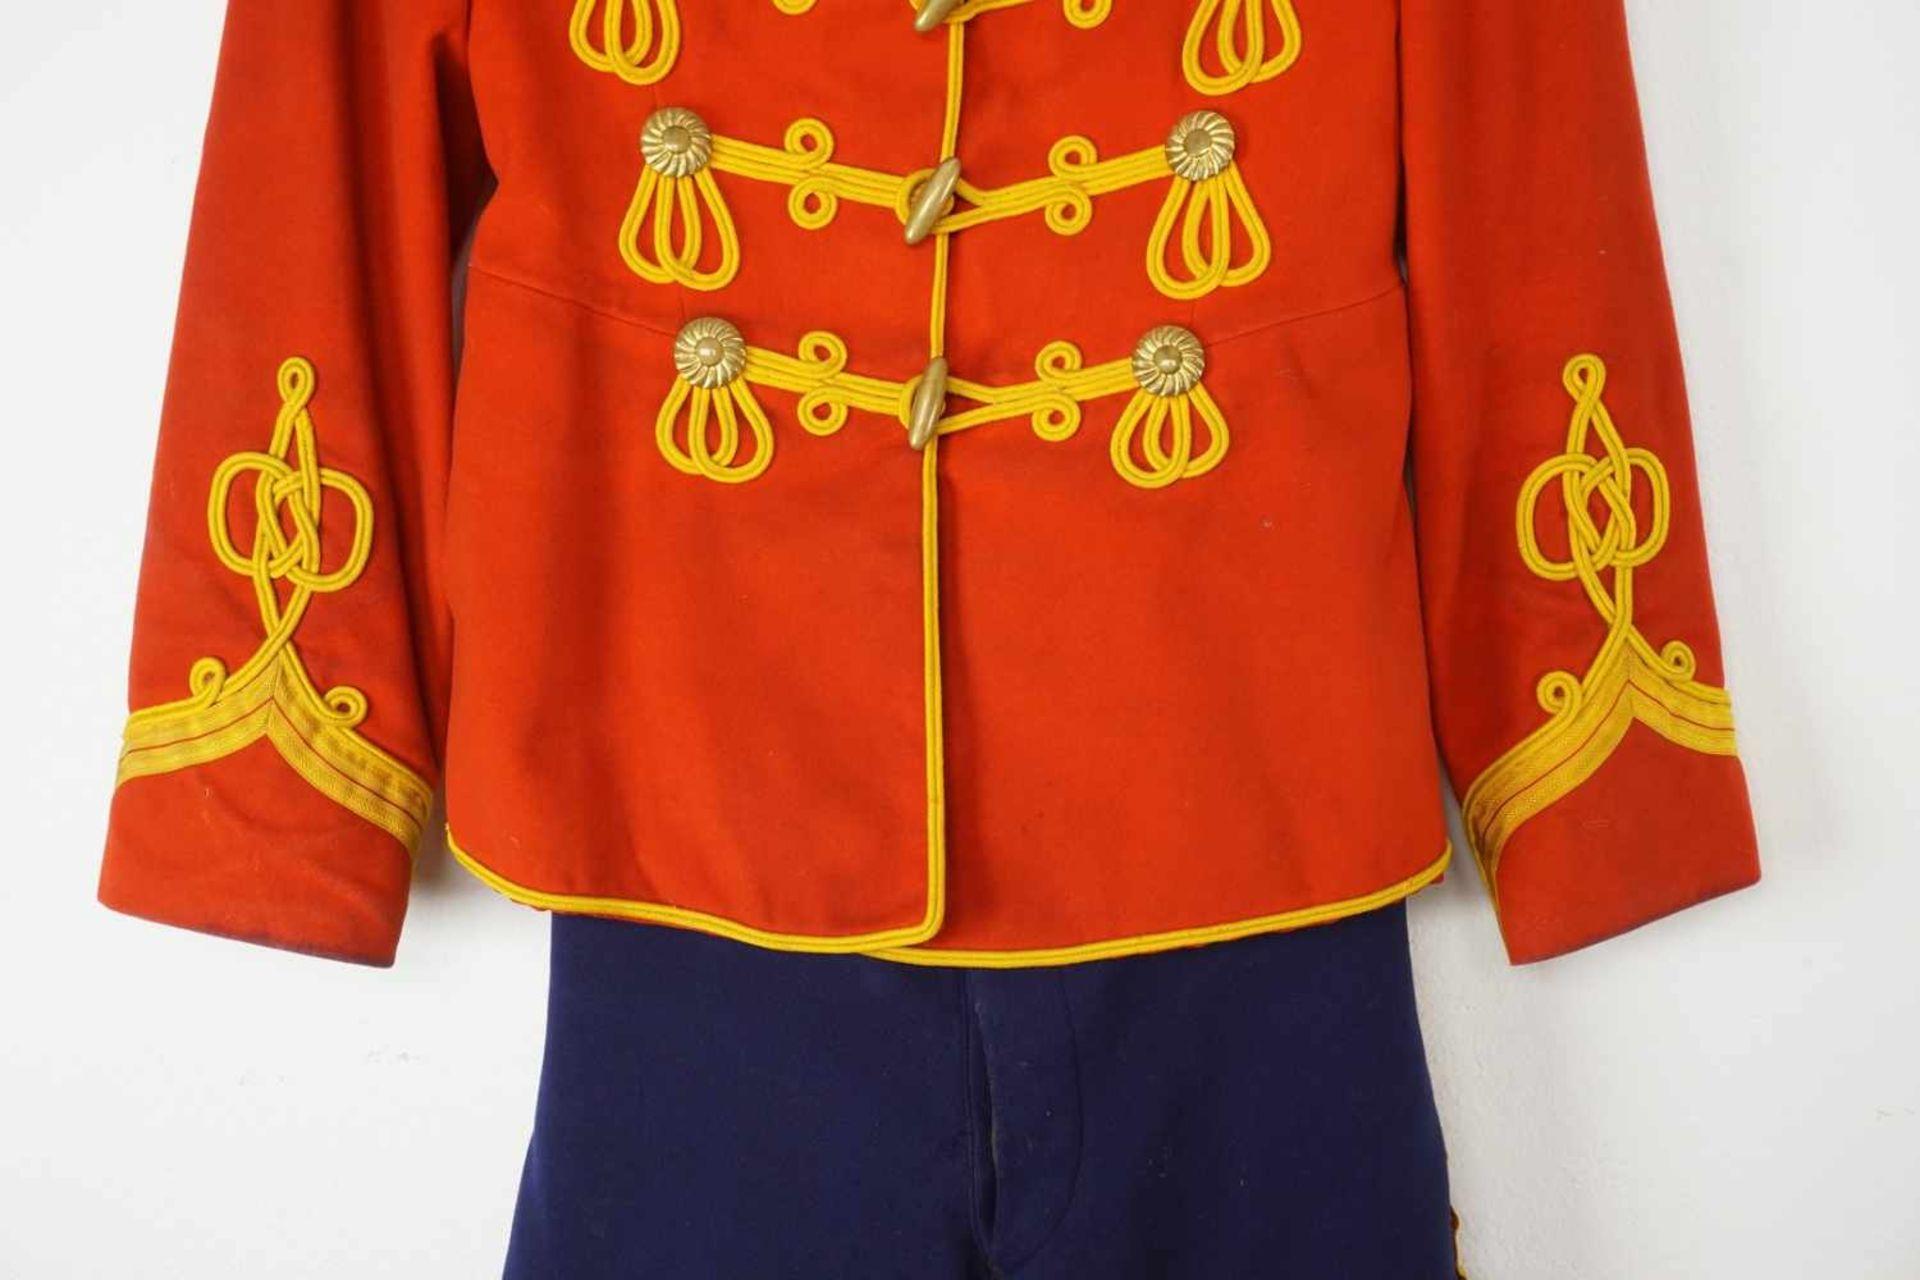 Uniform des Leib-Garde-Husaren-Regiments Potsdam, um 1900 - Bild 7 aus 9